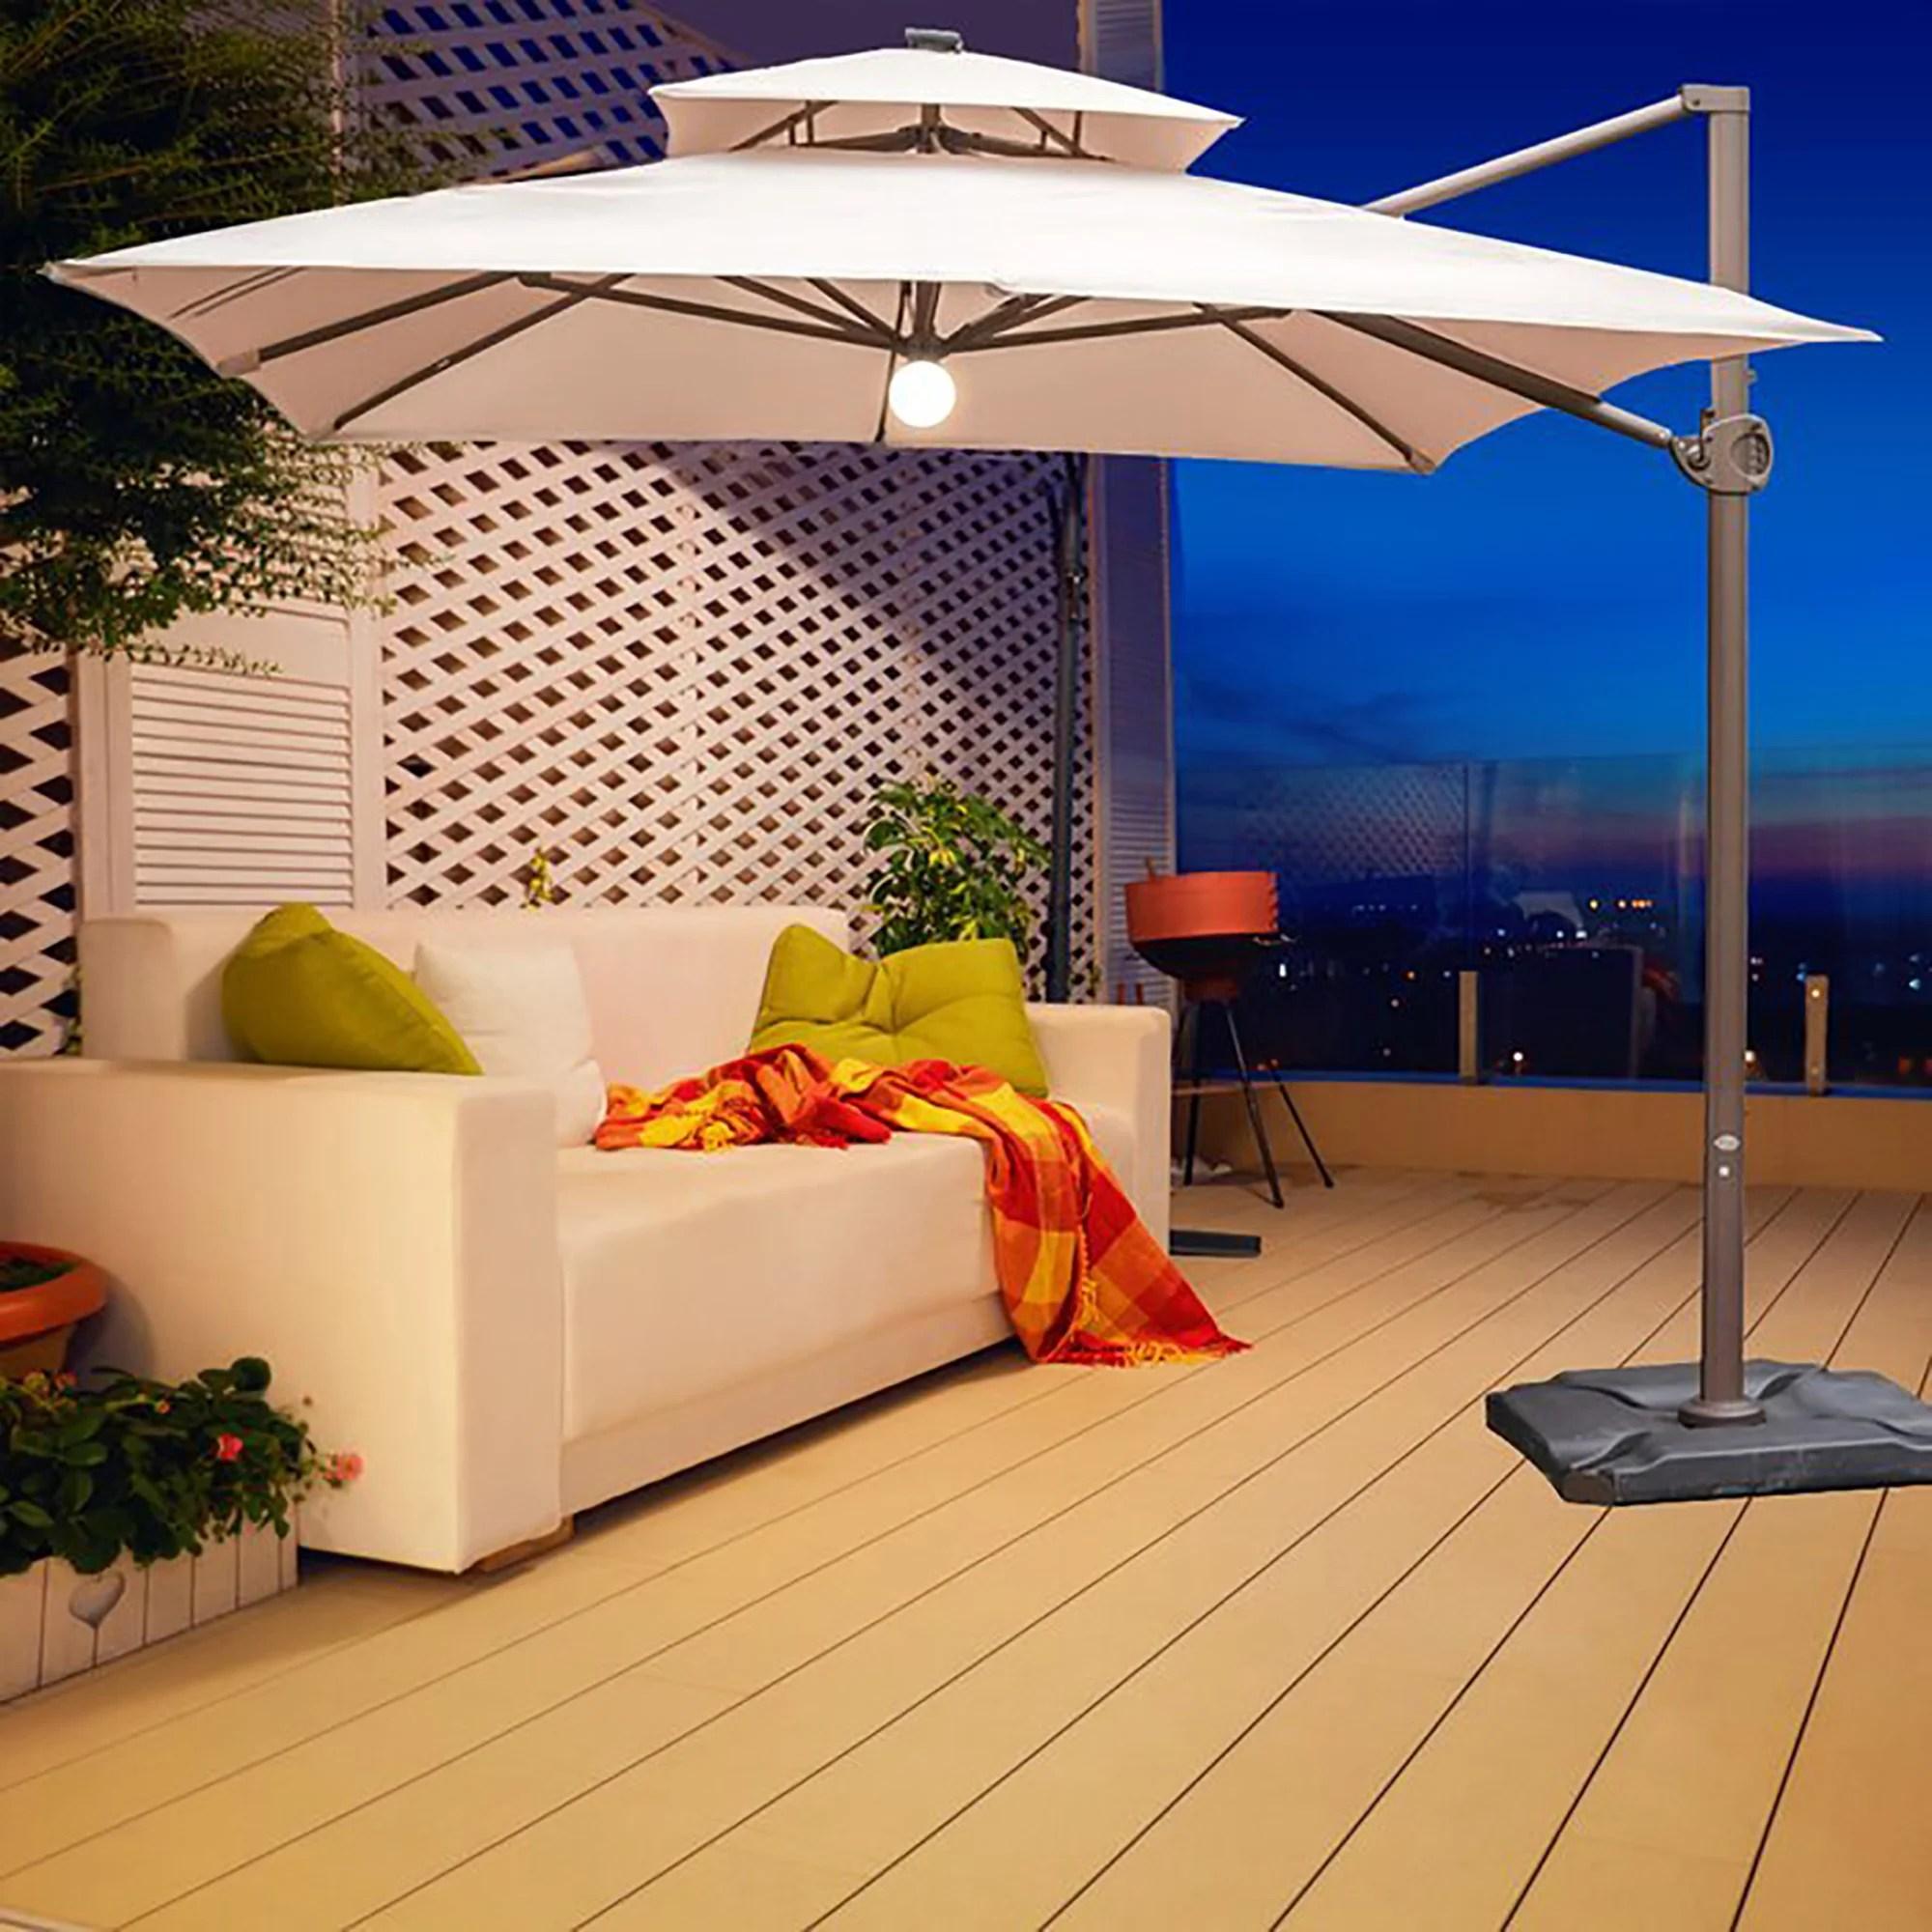 desmond 144 x 108 rectangular lighted cantilever umbrella